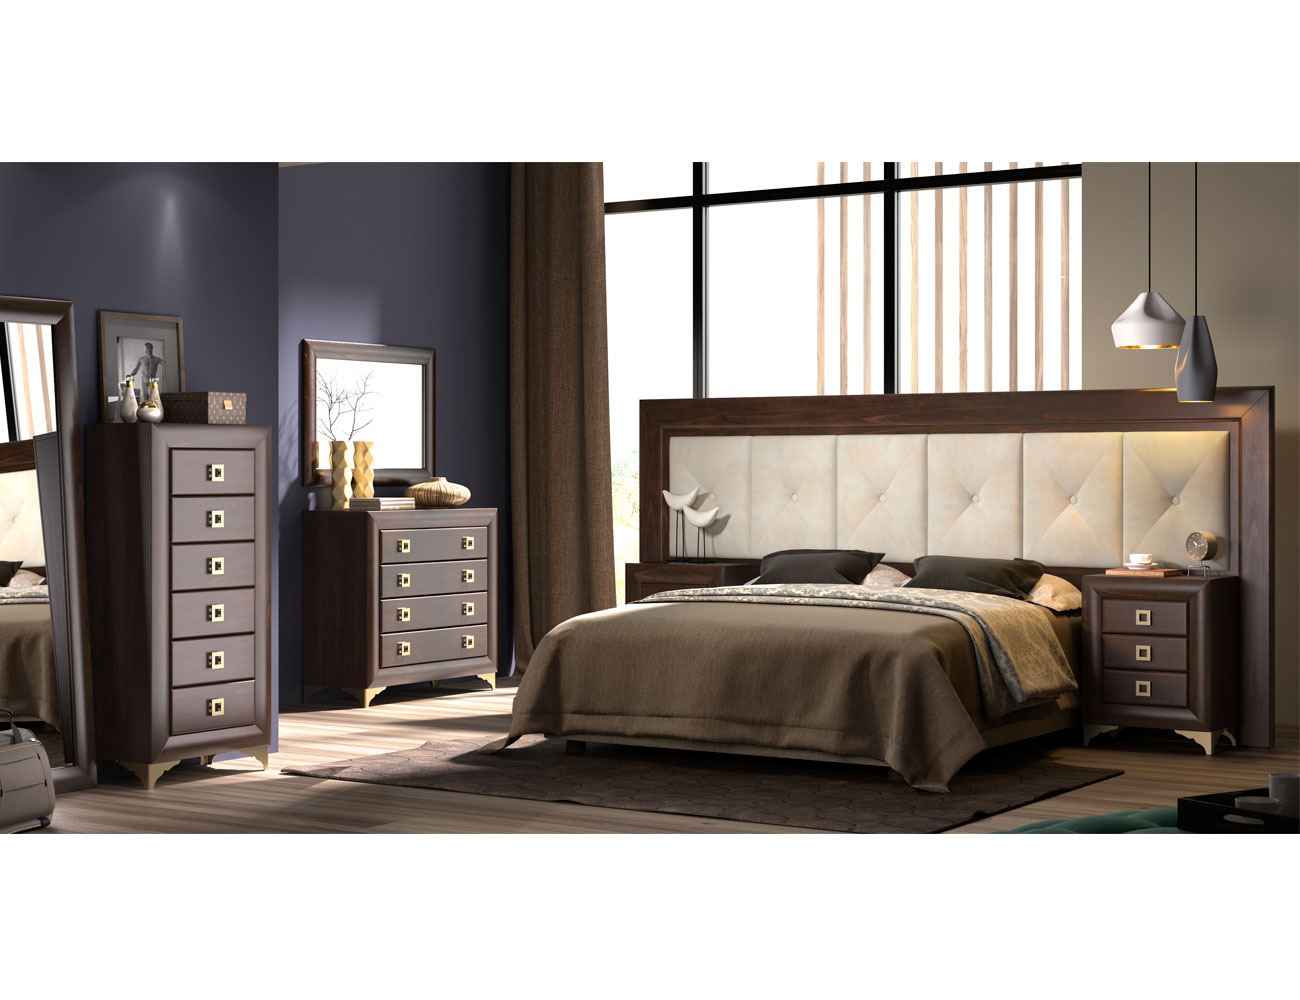 Dormitorio matrimonio nogal tapizado patas cabecero 285cm2